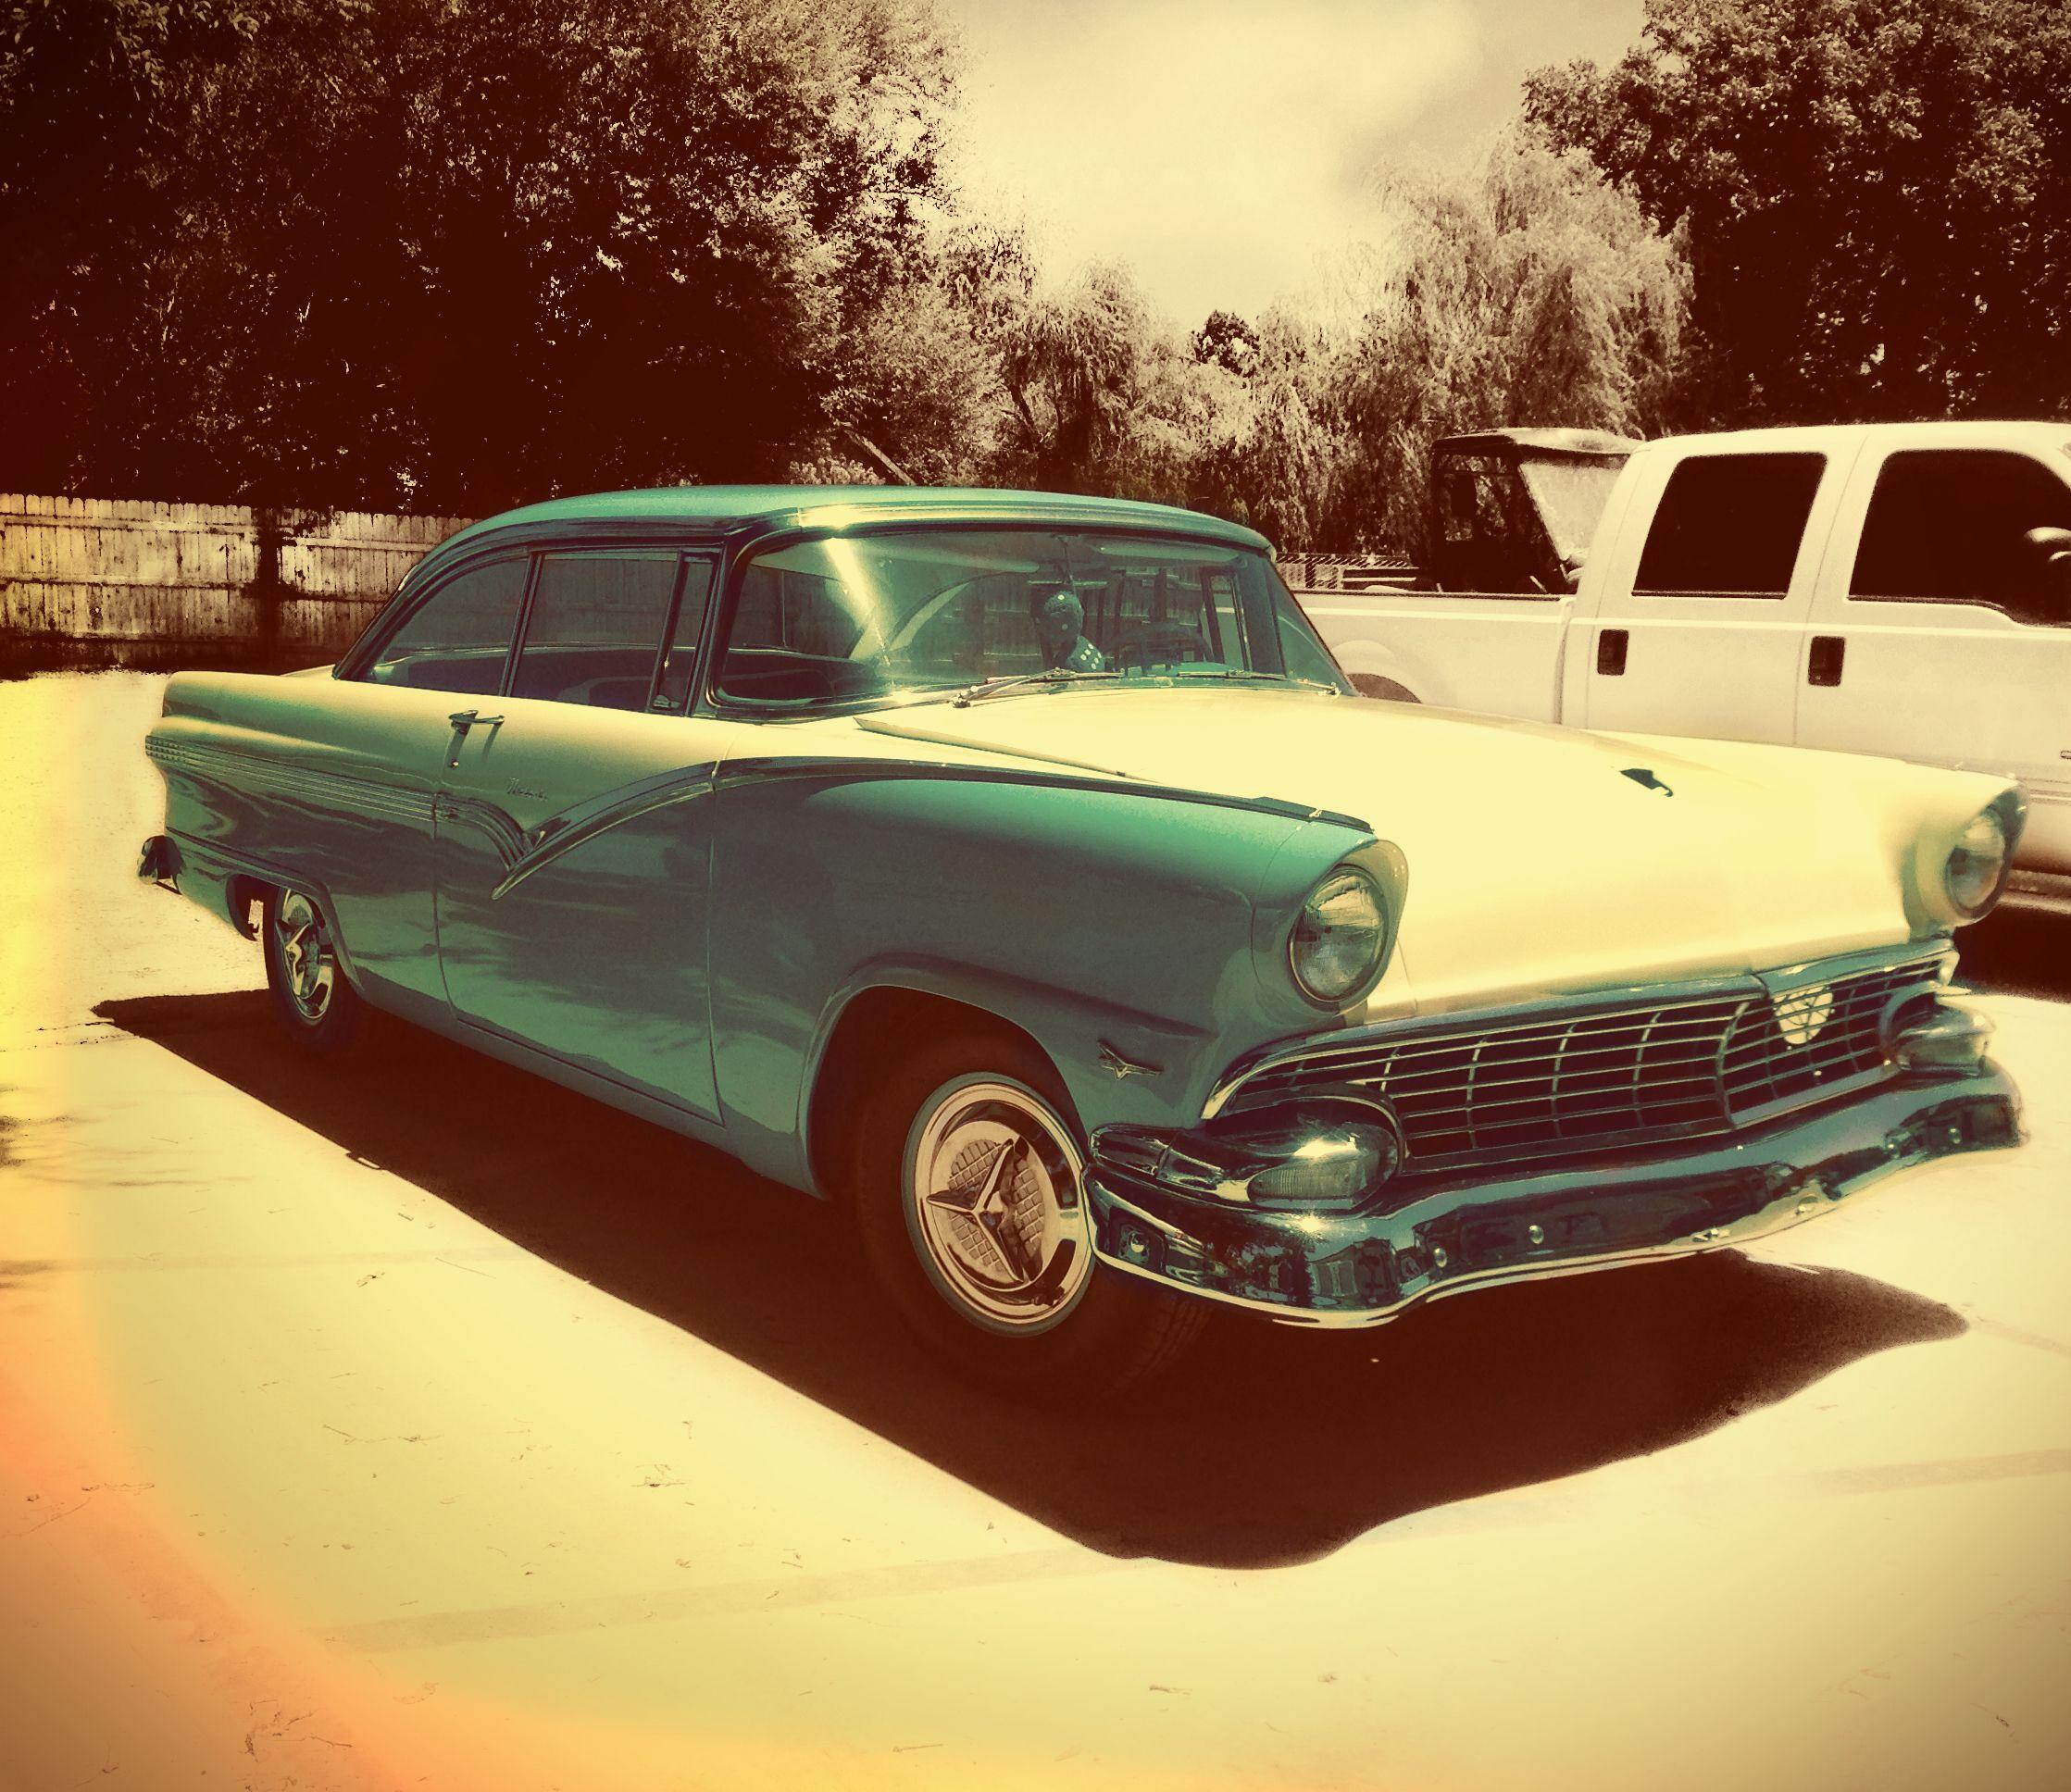 Old fashioned car #retro | My Old Fashion Side | Pinterest | Retro ...